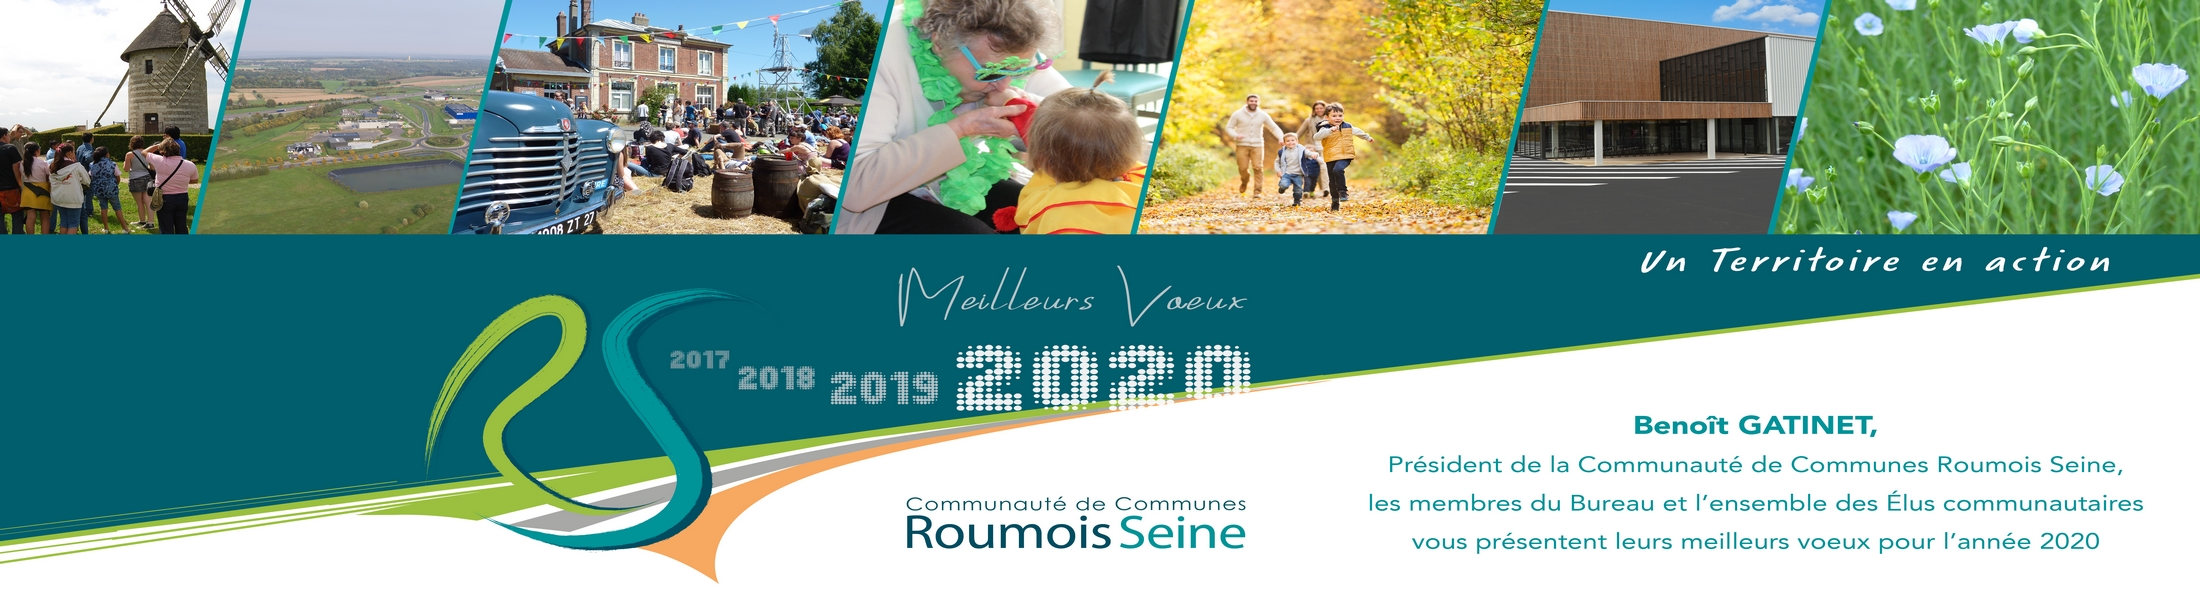 Roumois Seine